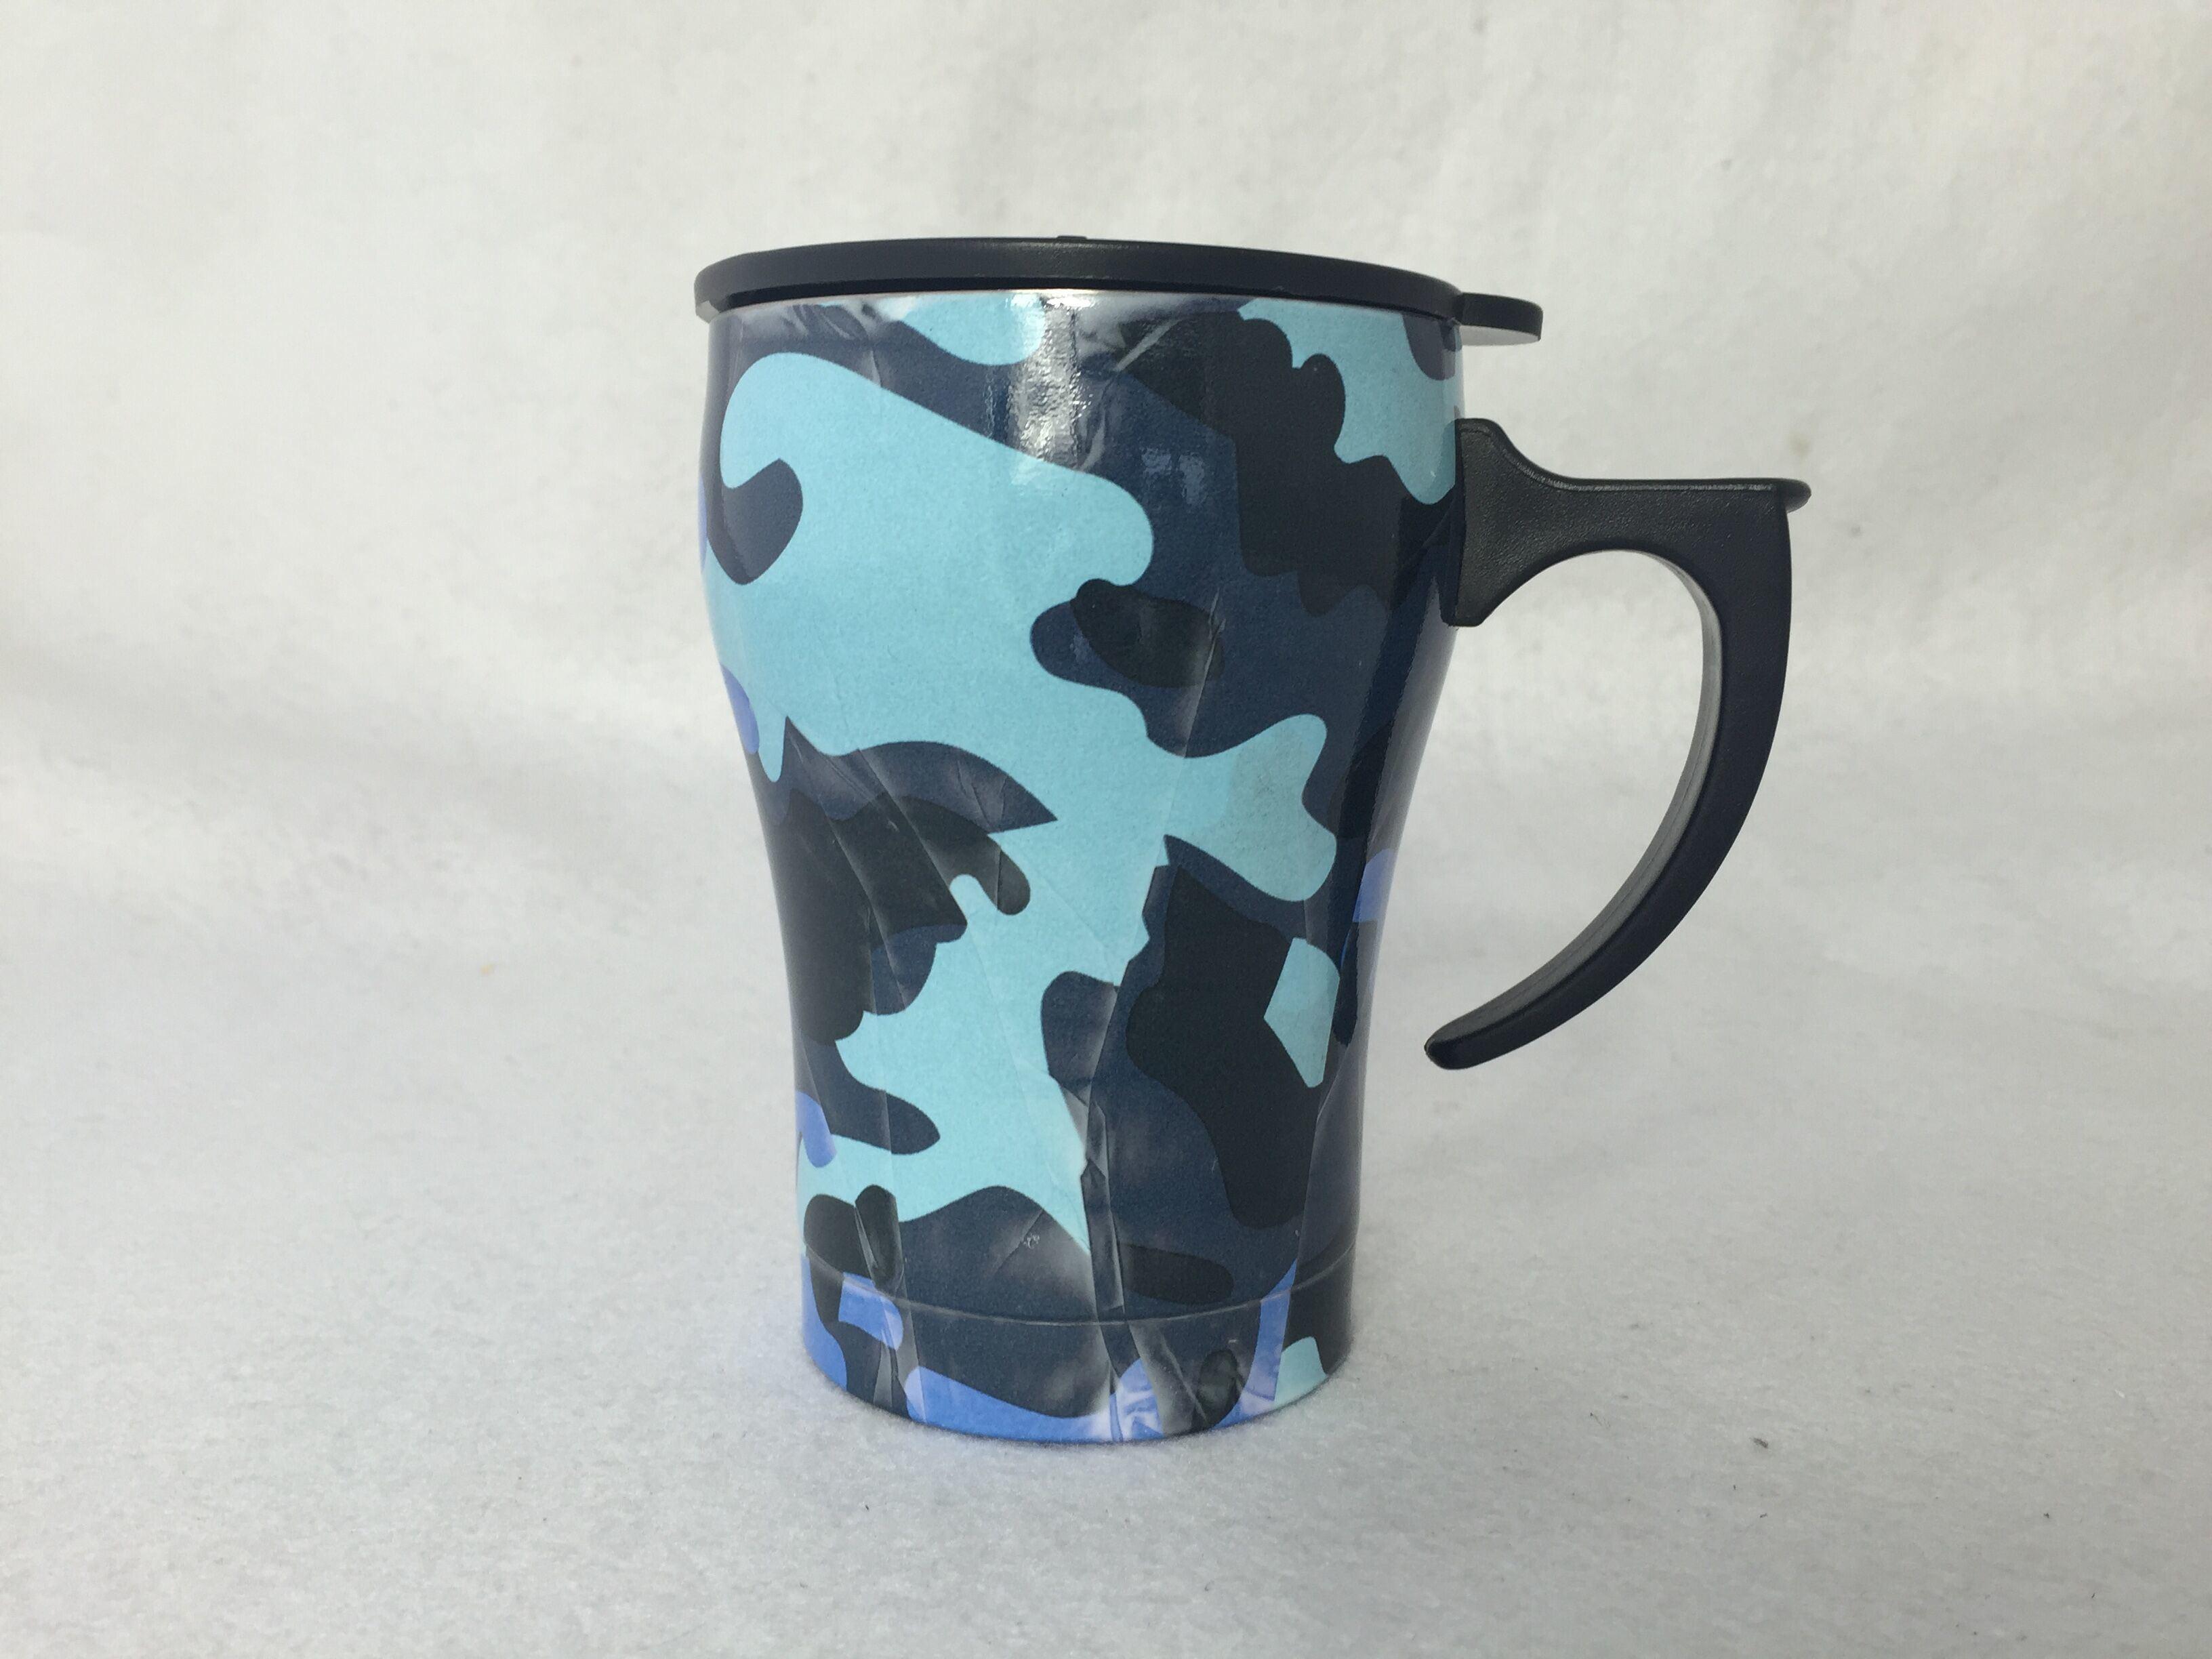 12oz Wood Grain Tumbler Coffee Mug Beer Cup Travel Pot